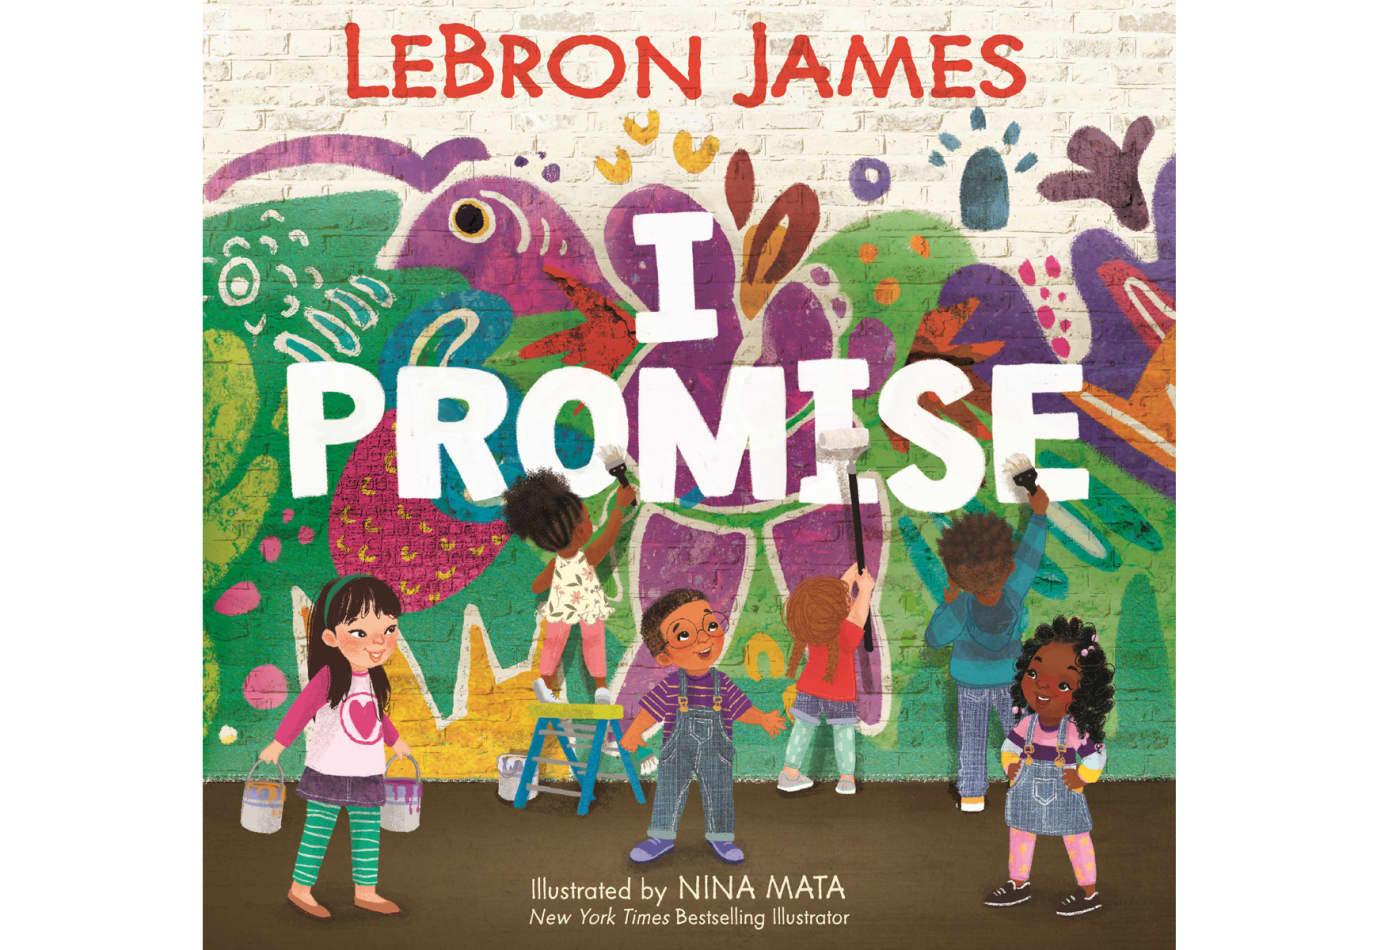 LeBron James: Basketball player, businessman and now author